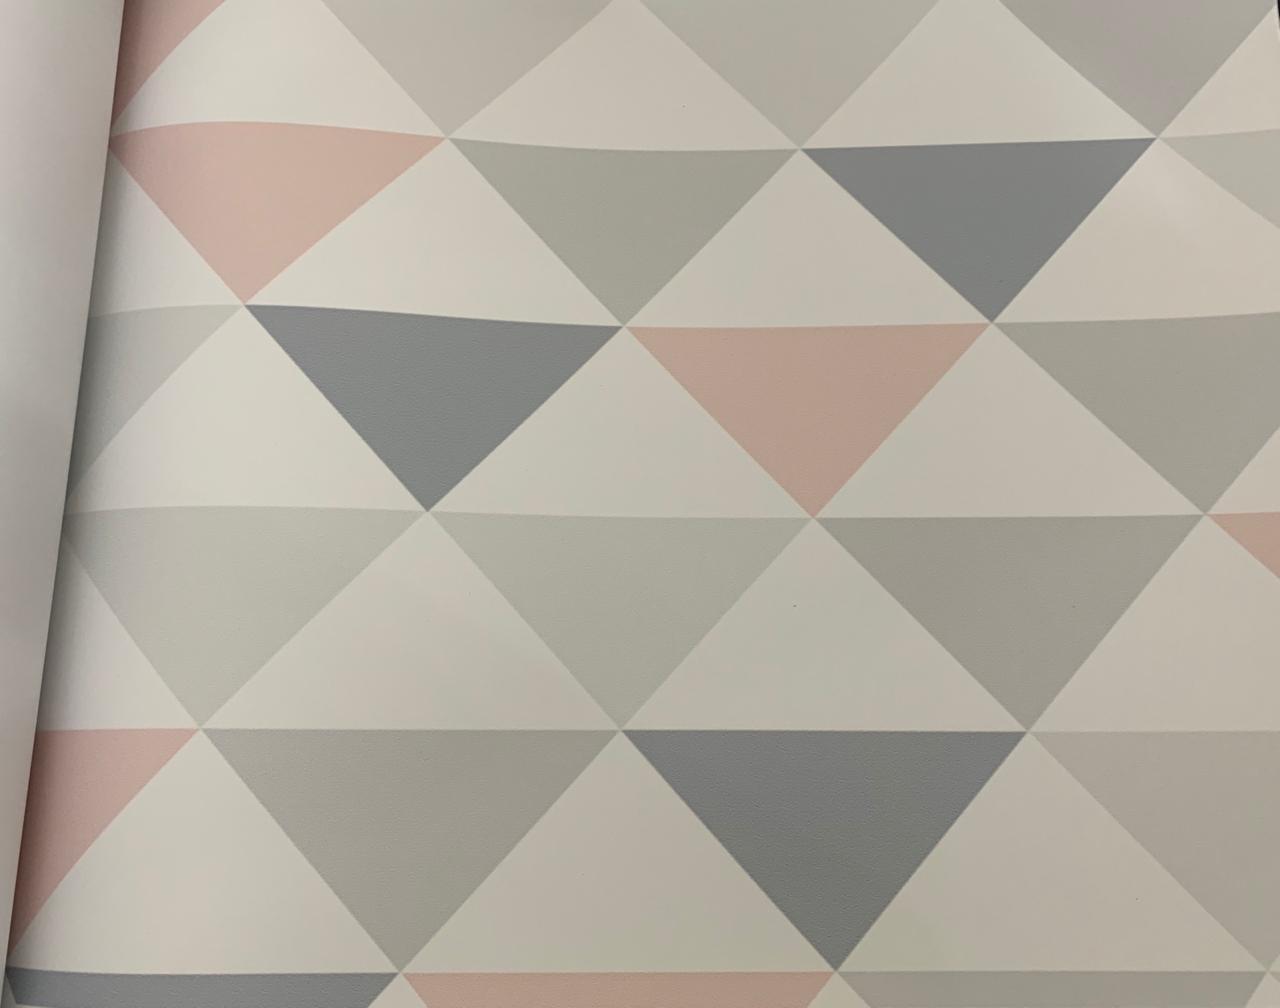 Papel de Parede Triângulo Rosa e Cinza